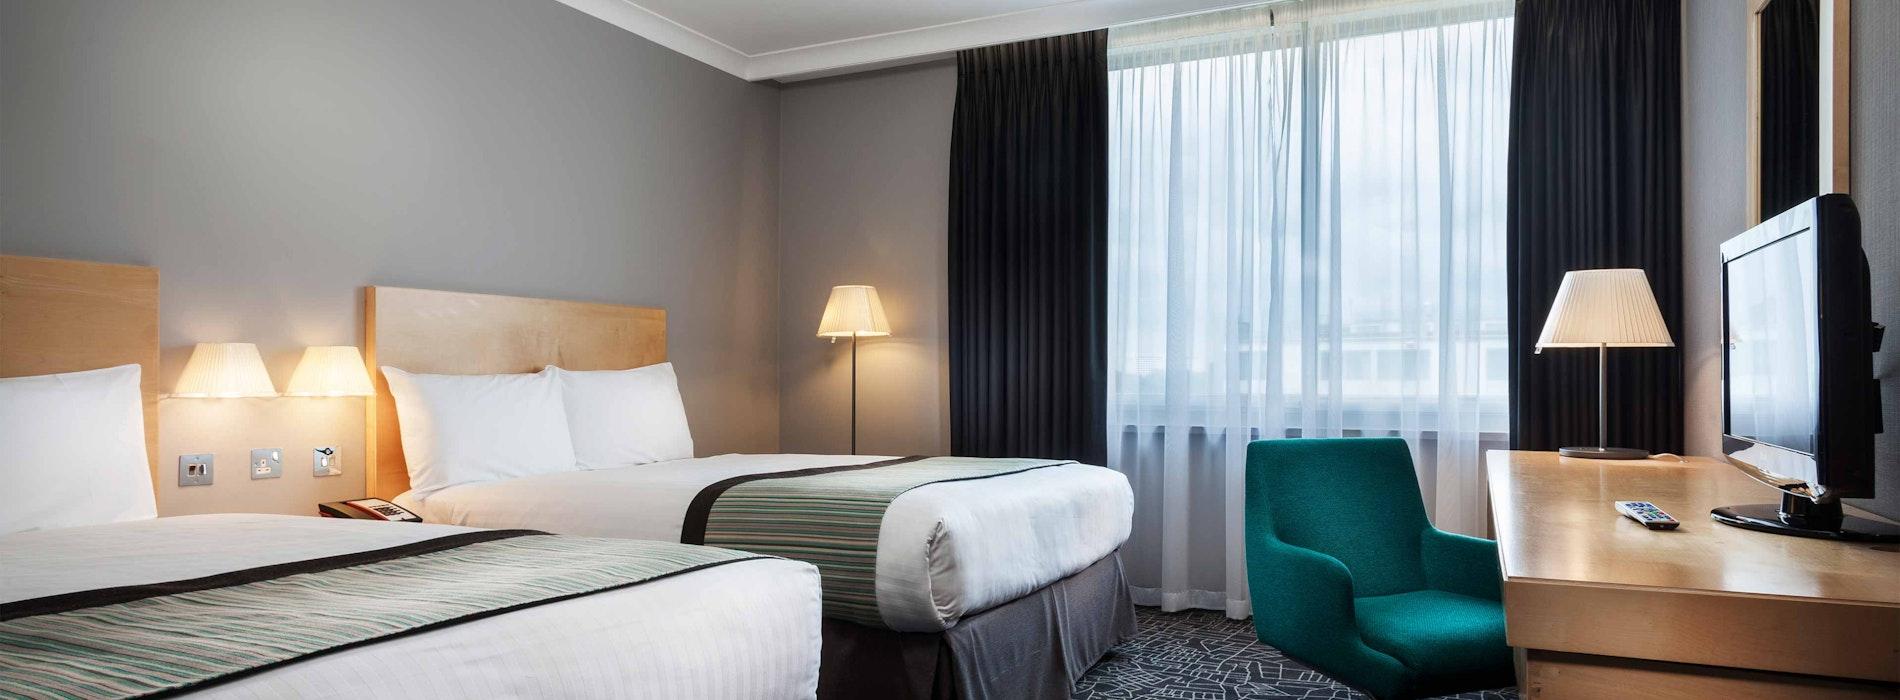 Radisson Hotel Heathrow near LEGOLAND® Windsor Resort